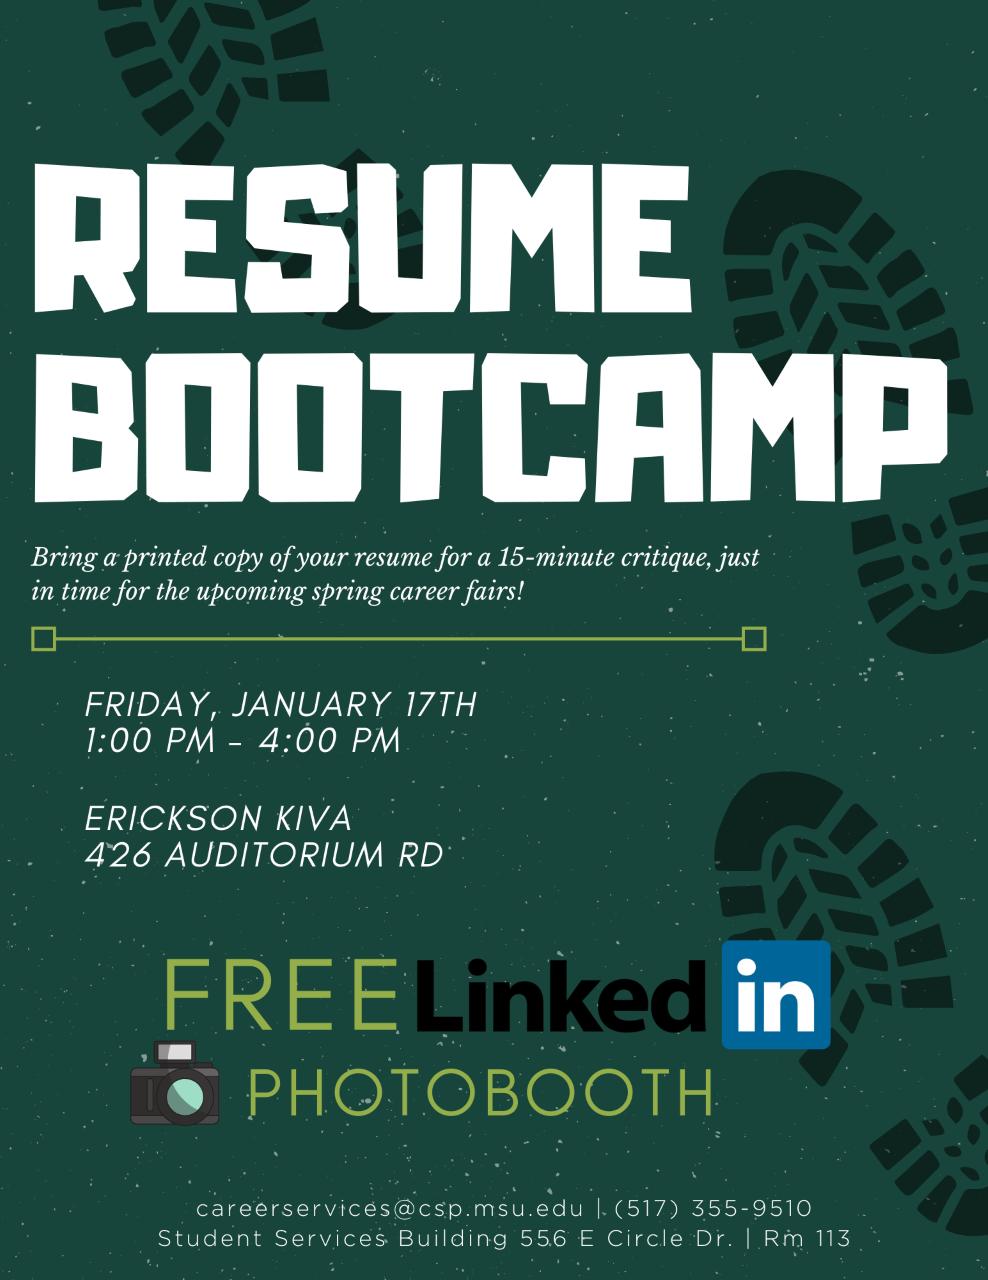 Resume Bootcamp @ Erickson Kiva